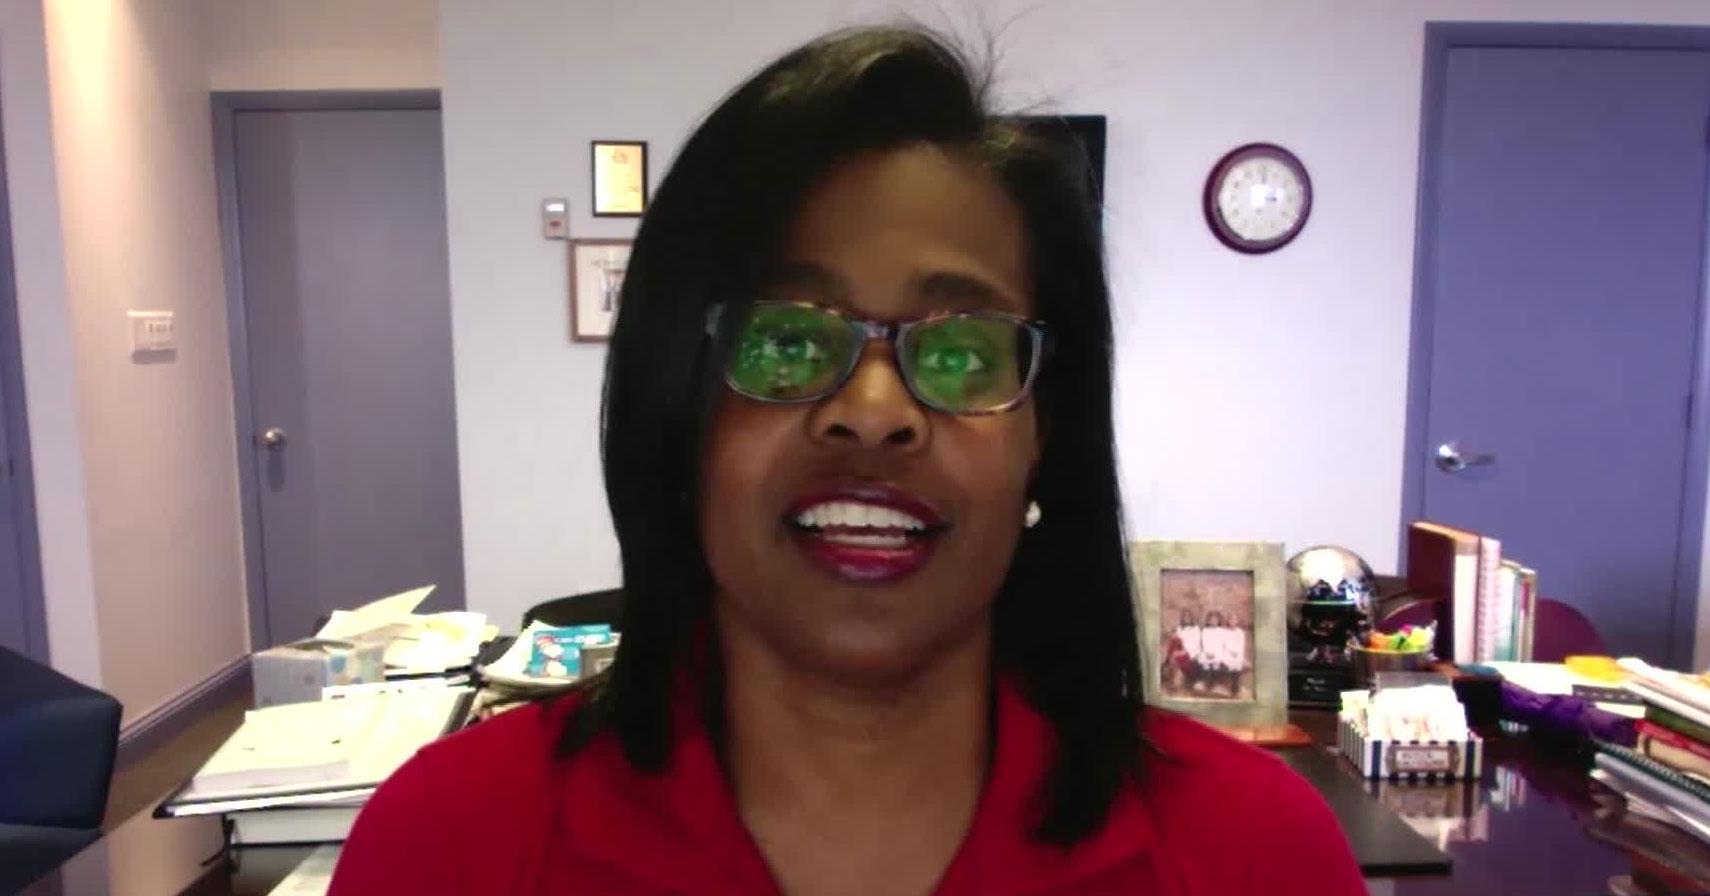 Sonja Santelises, the CEO of Baltimore City Public Schools, speaks during CNN's Sesame Street town hall on Saturday.